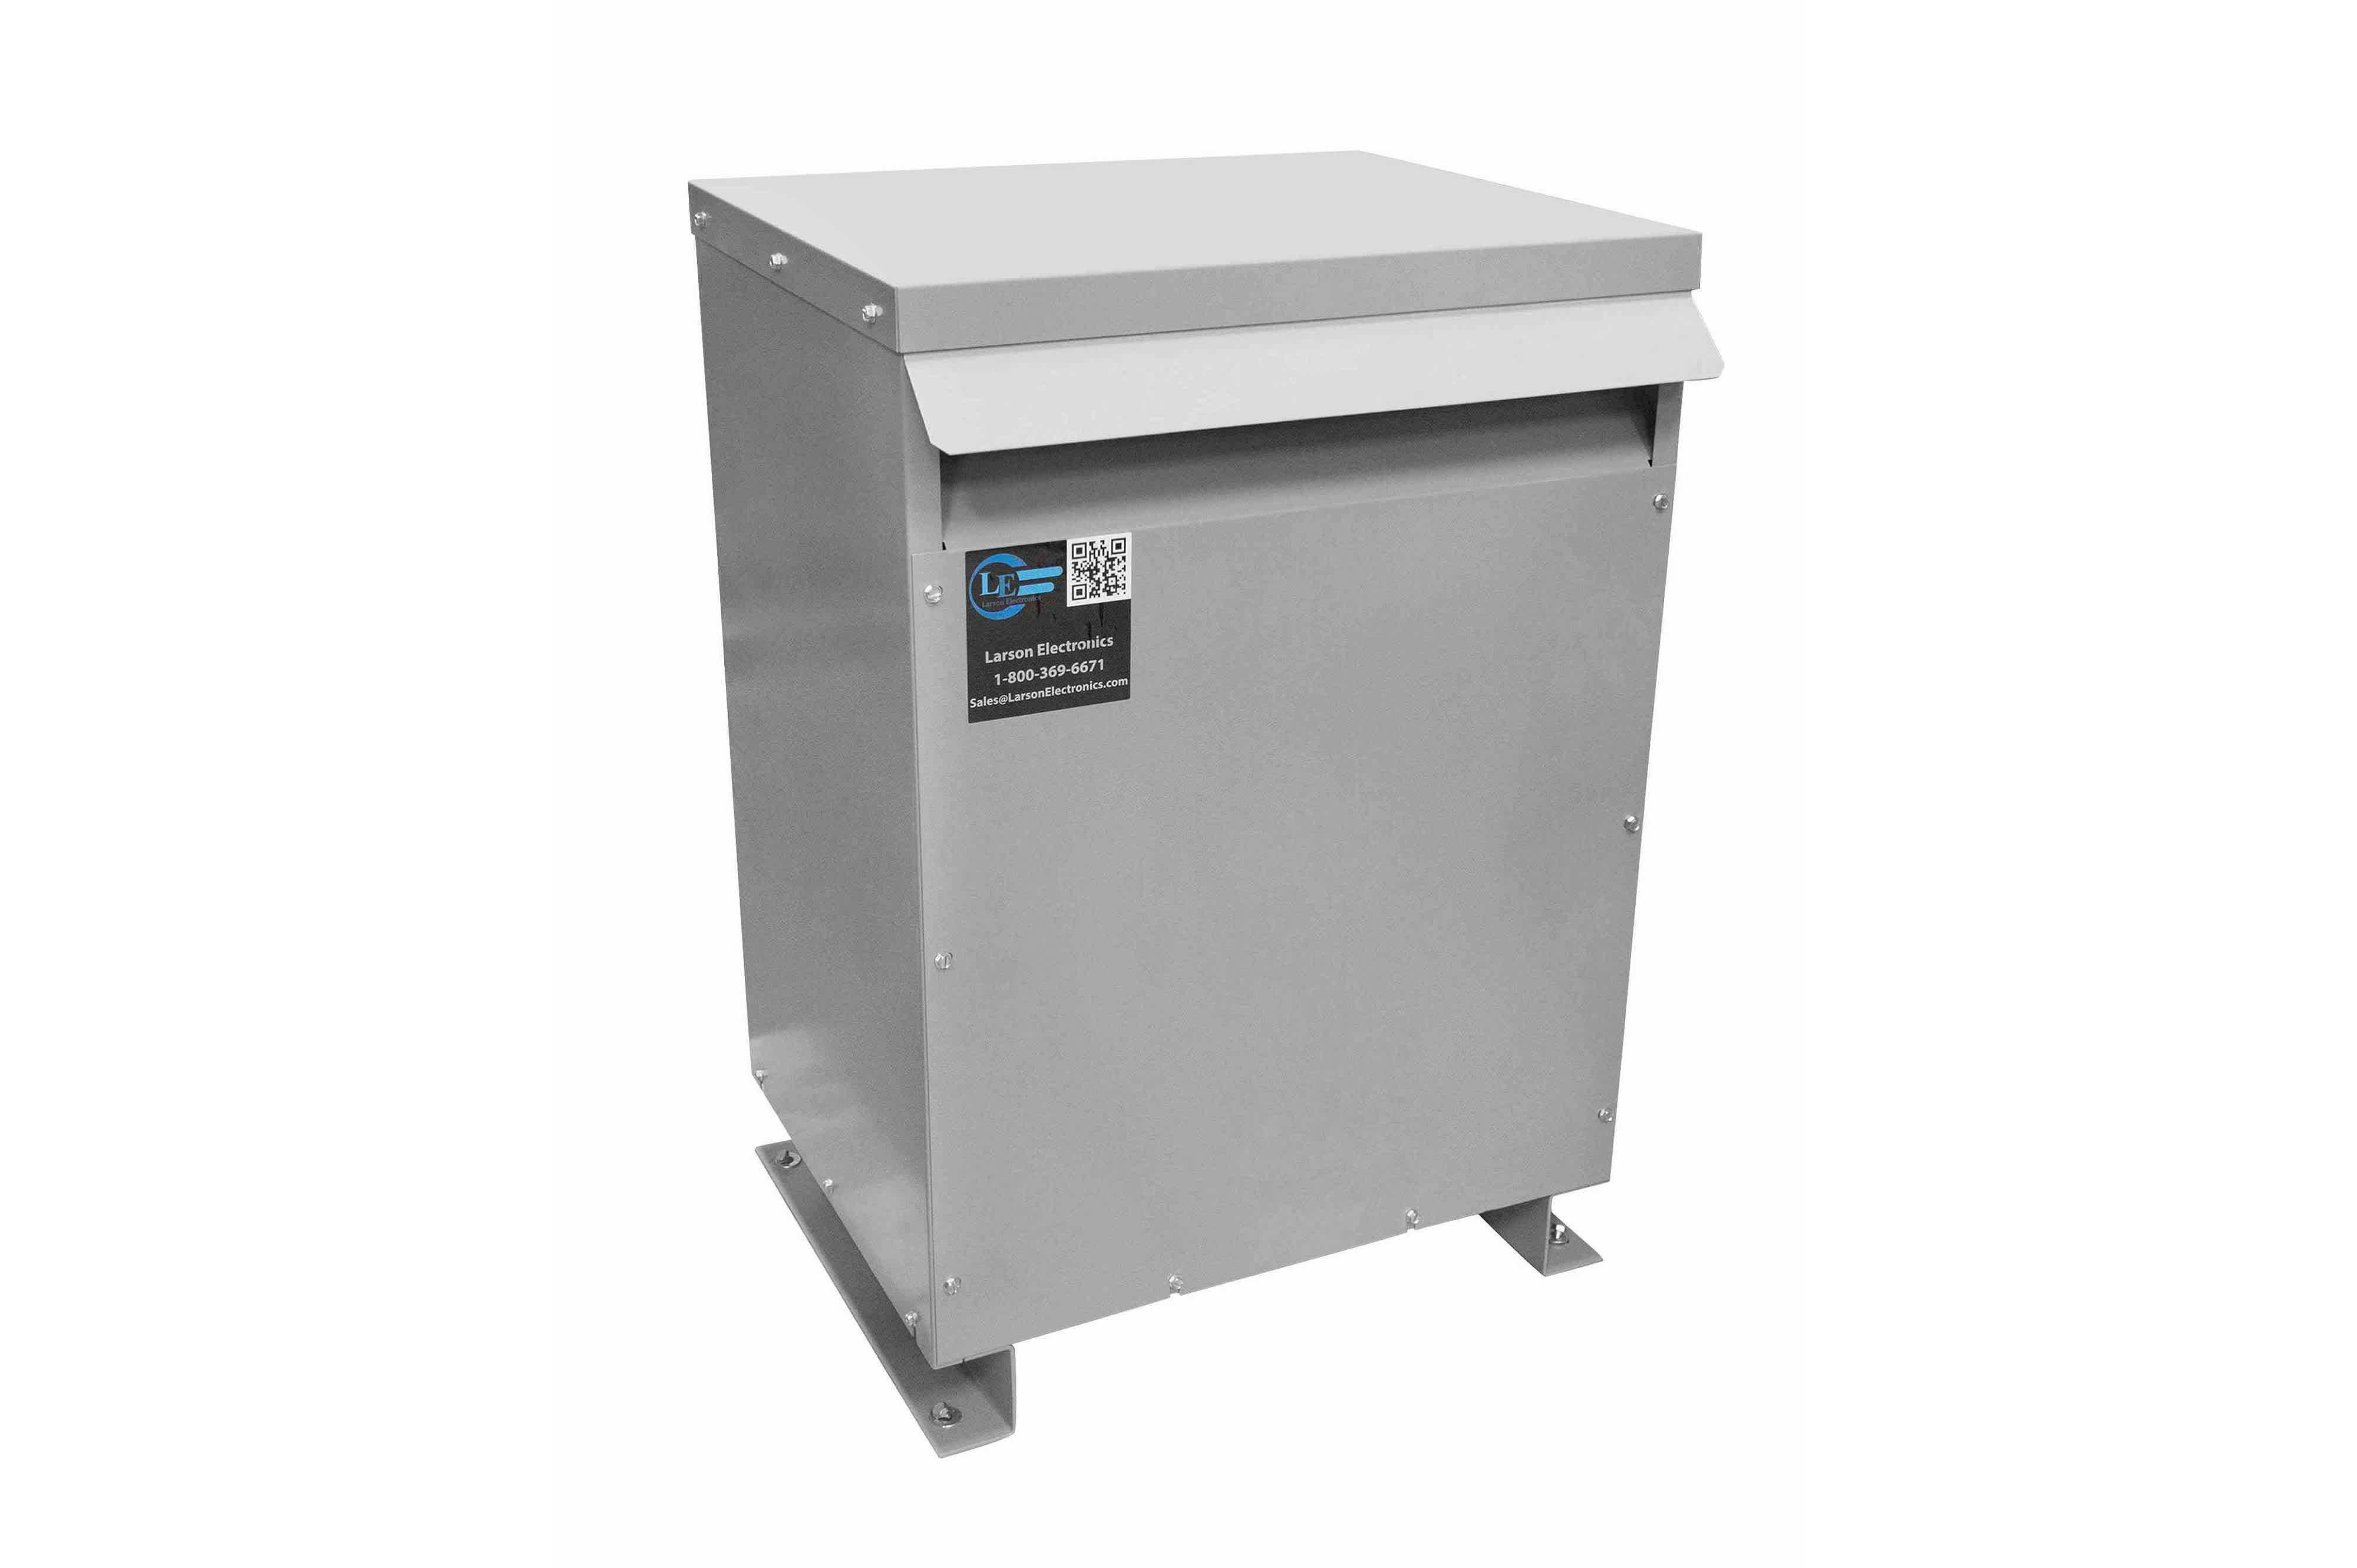 60 kVA 3PH Isolation Transformer, 600V Wye Primary, 208V Delta Secondary, N3R, Ventilated, 60 Hz